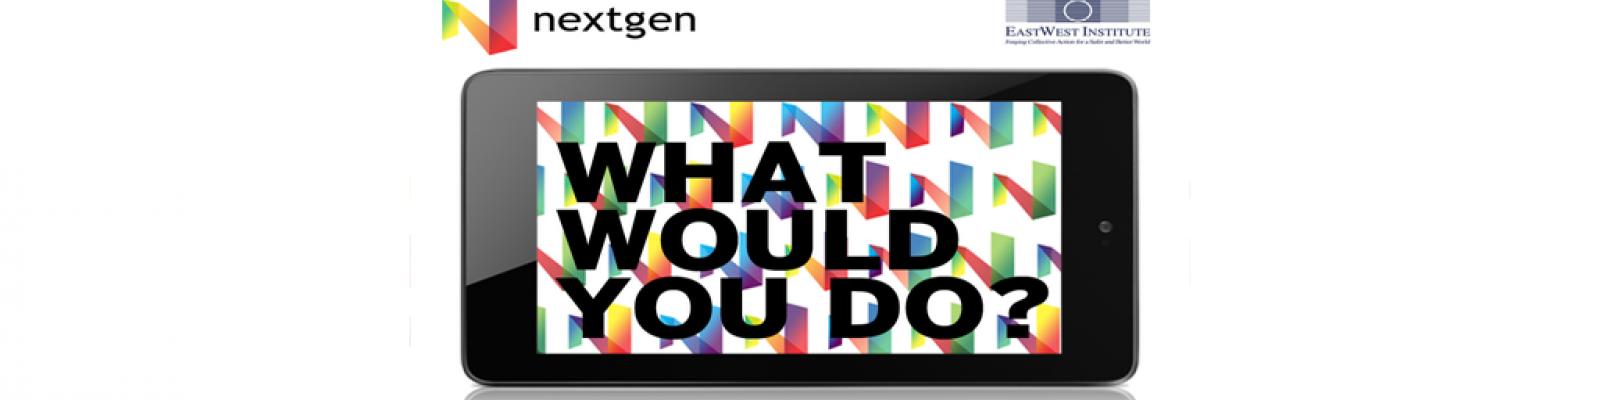 Nextgen Essay Competition Winner Announced